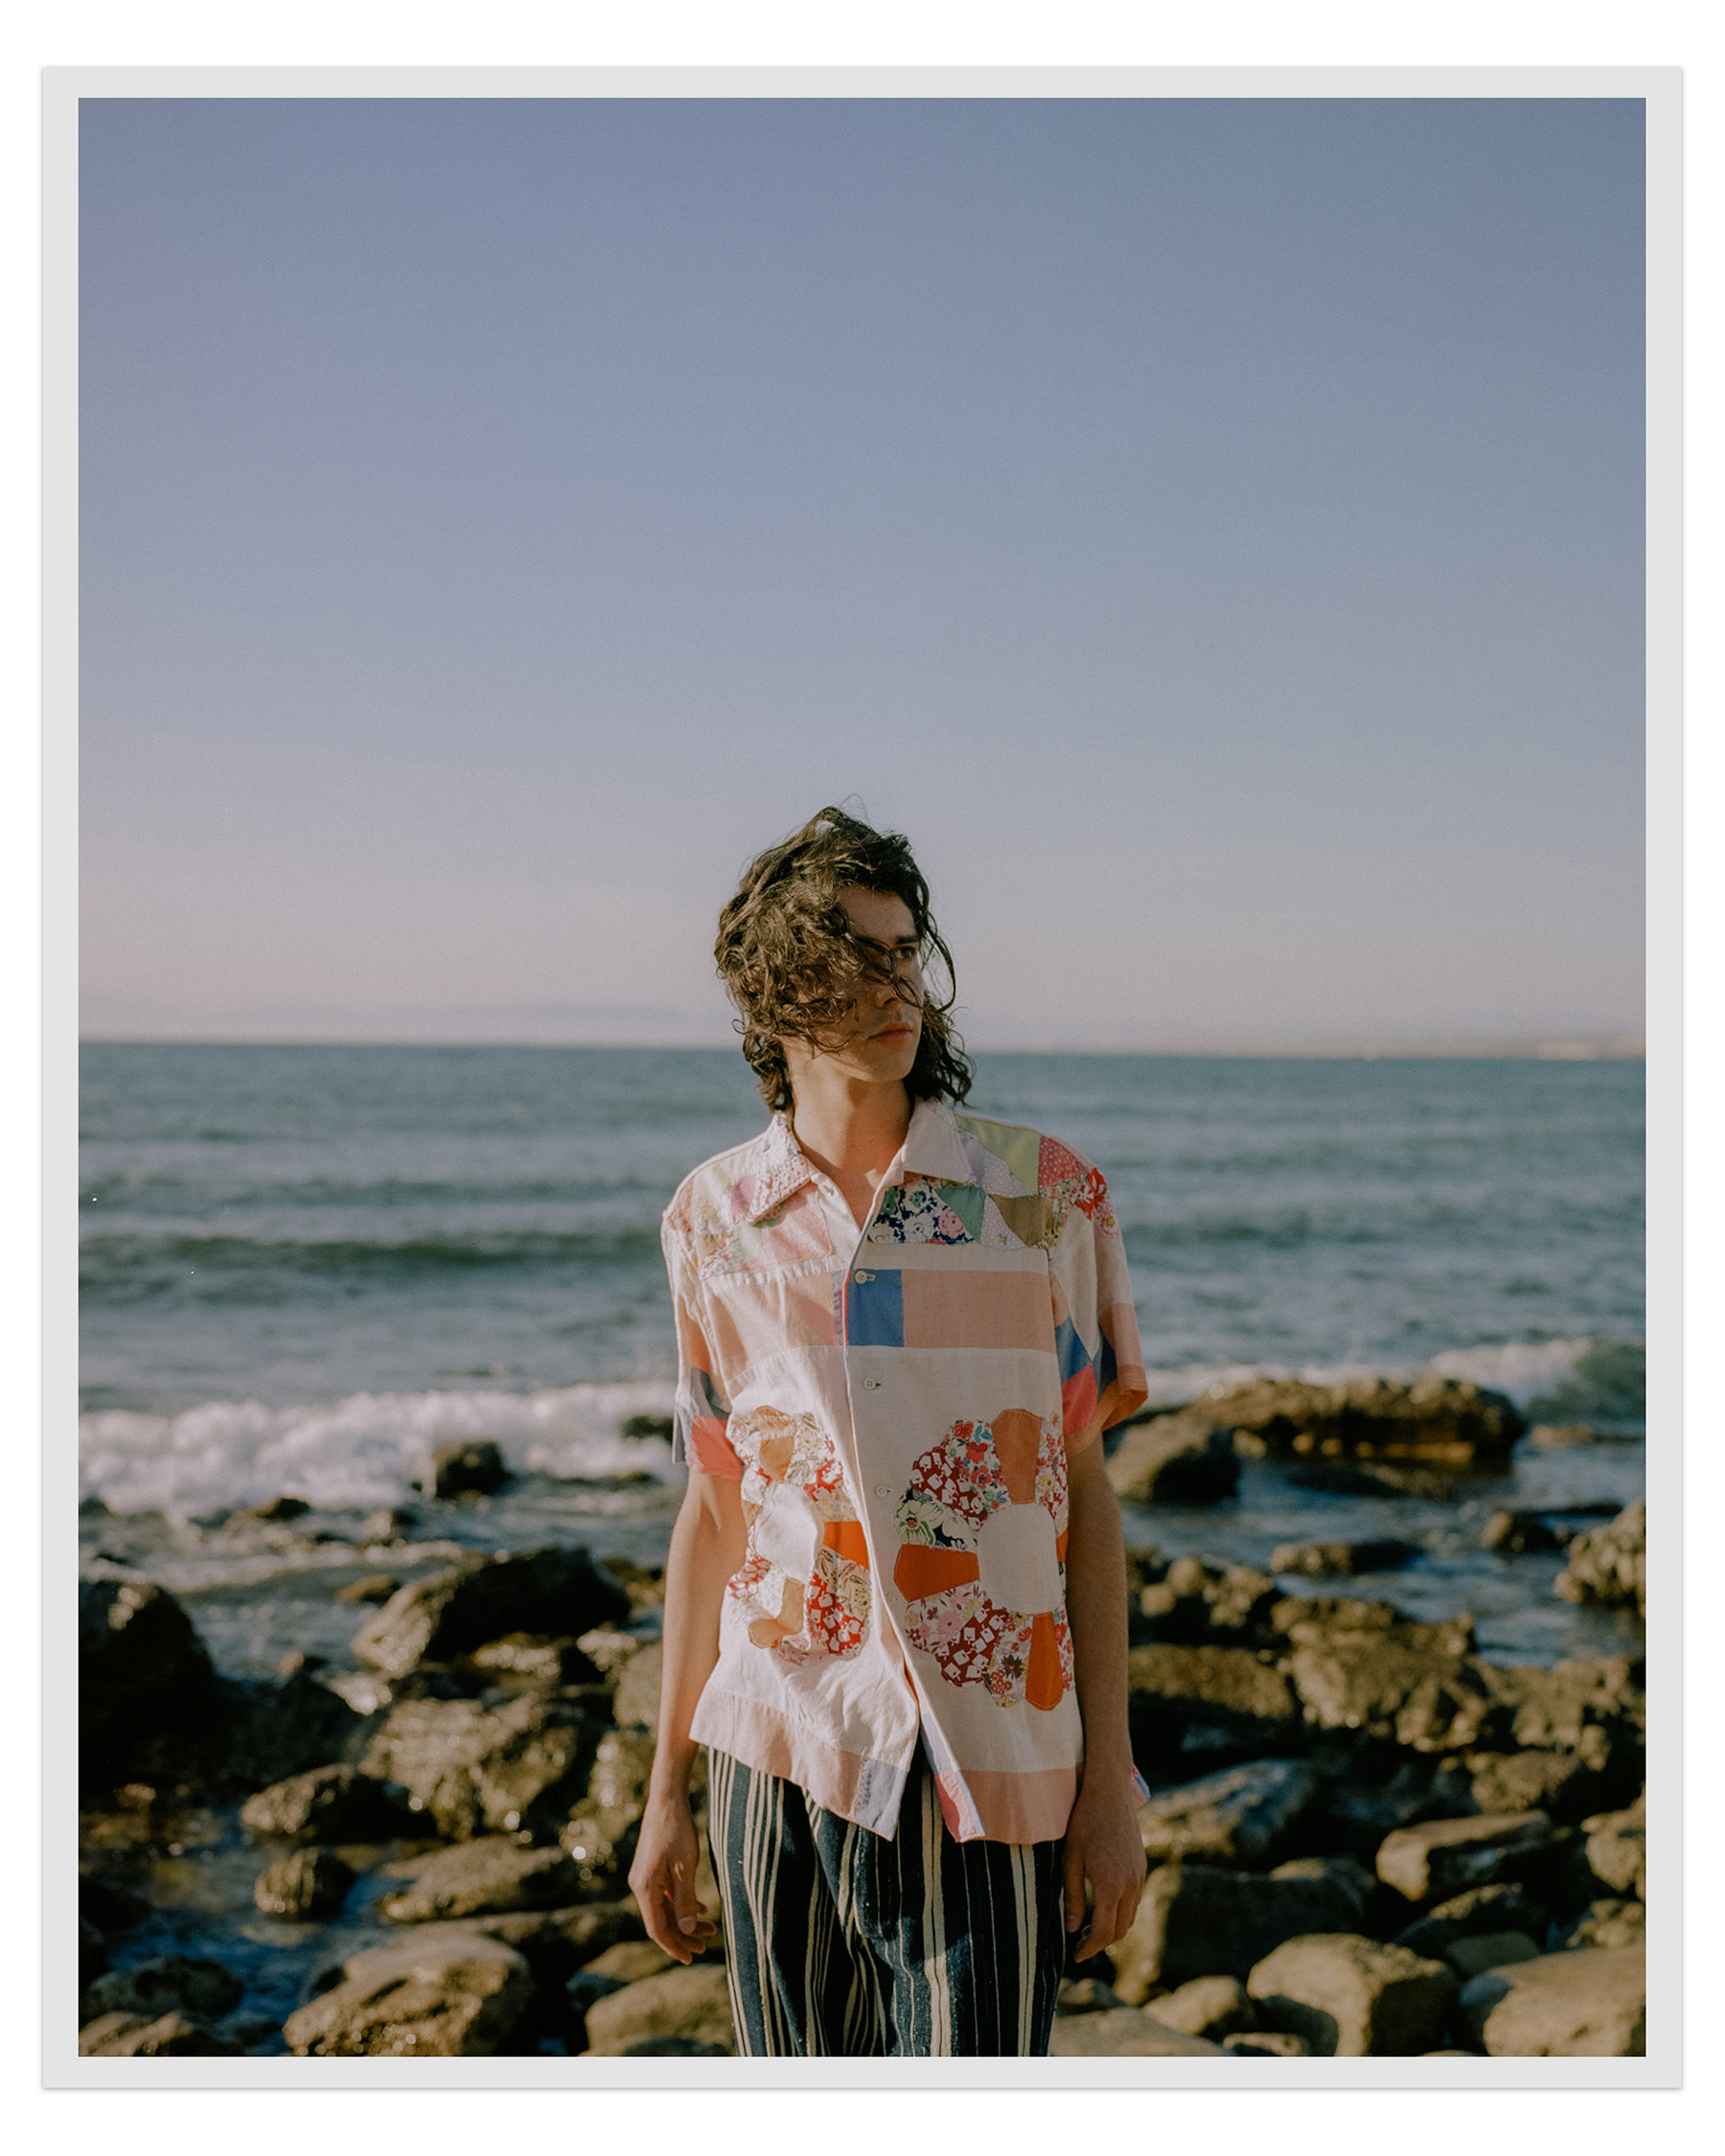 iGNANT-Photography-John-Clayton-Lee-Selection-009